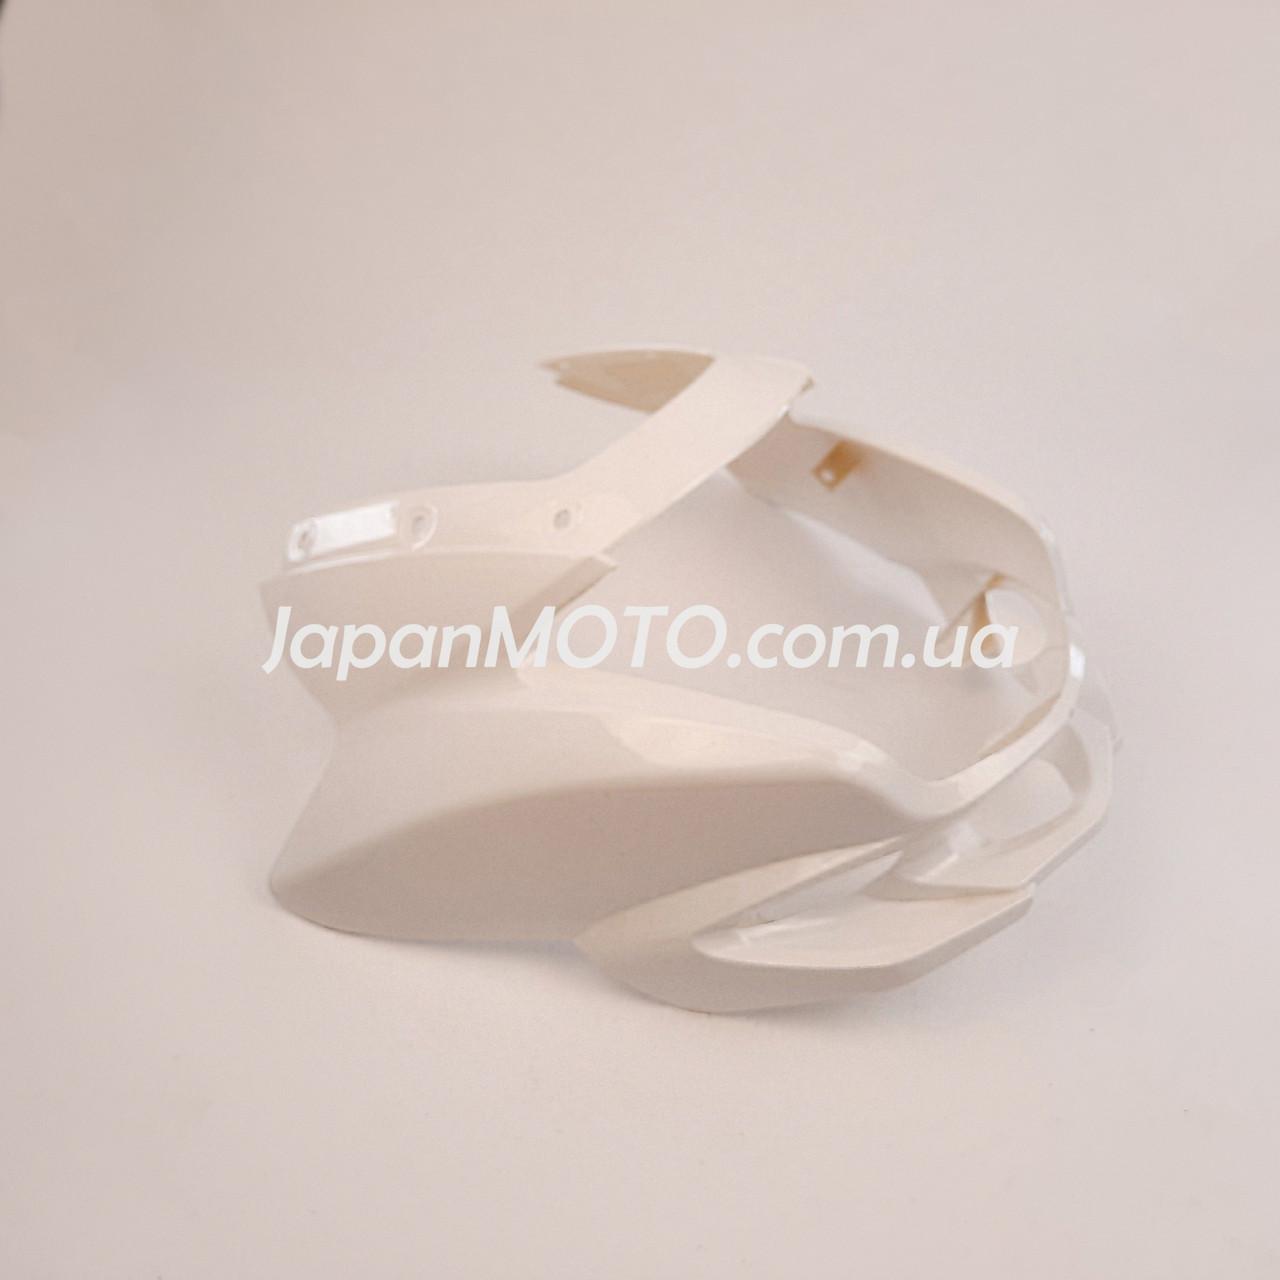 Голова (пластик, облицювання фари) Spark SP200R-25